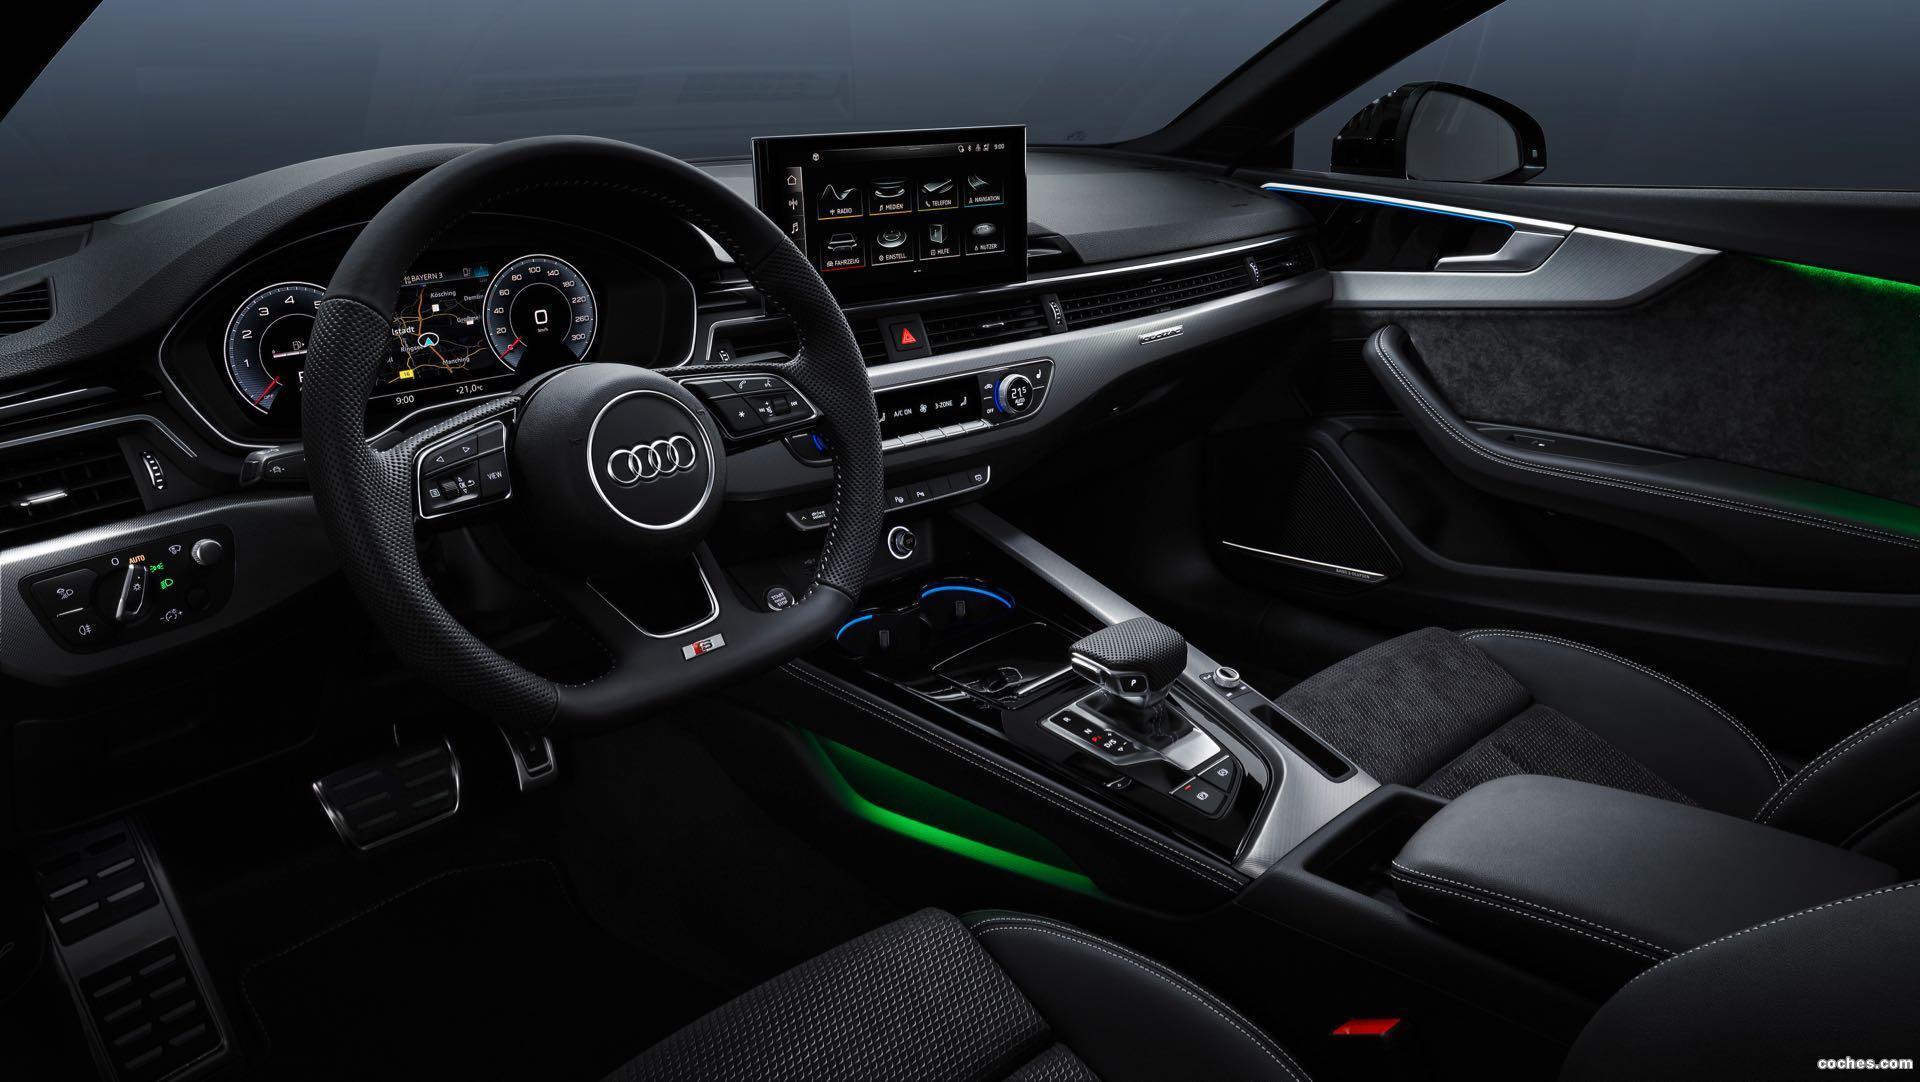 Foto 10 de Audi A5 40 TFSI quattro S line 2019